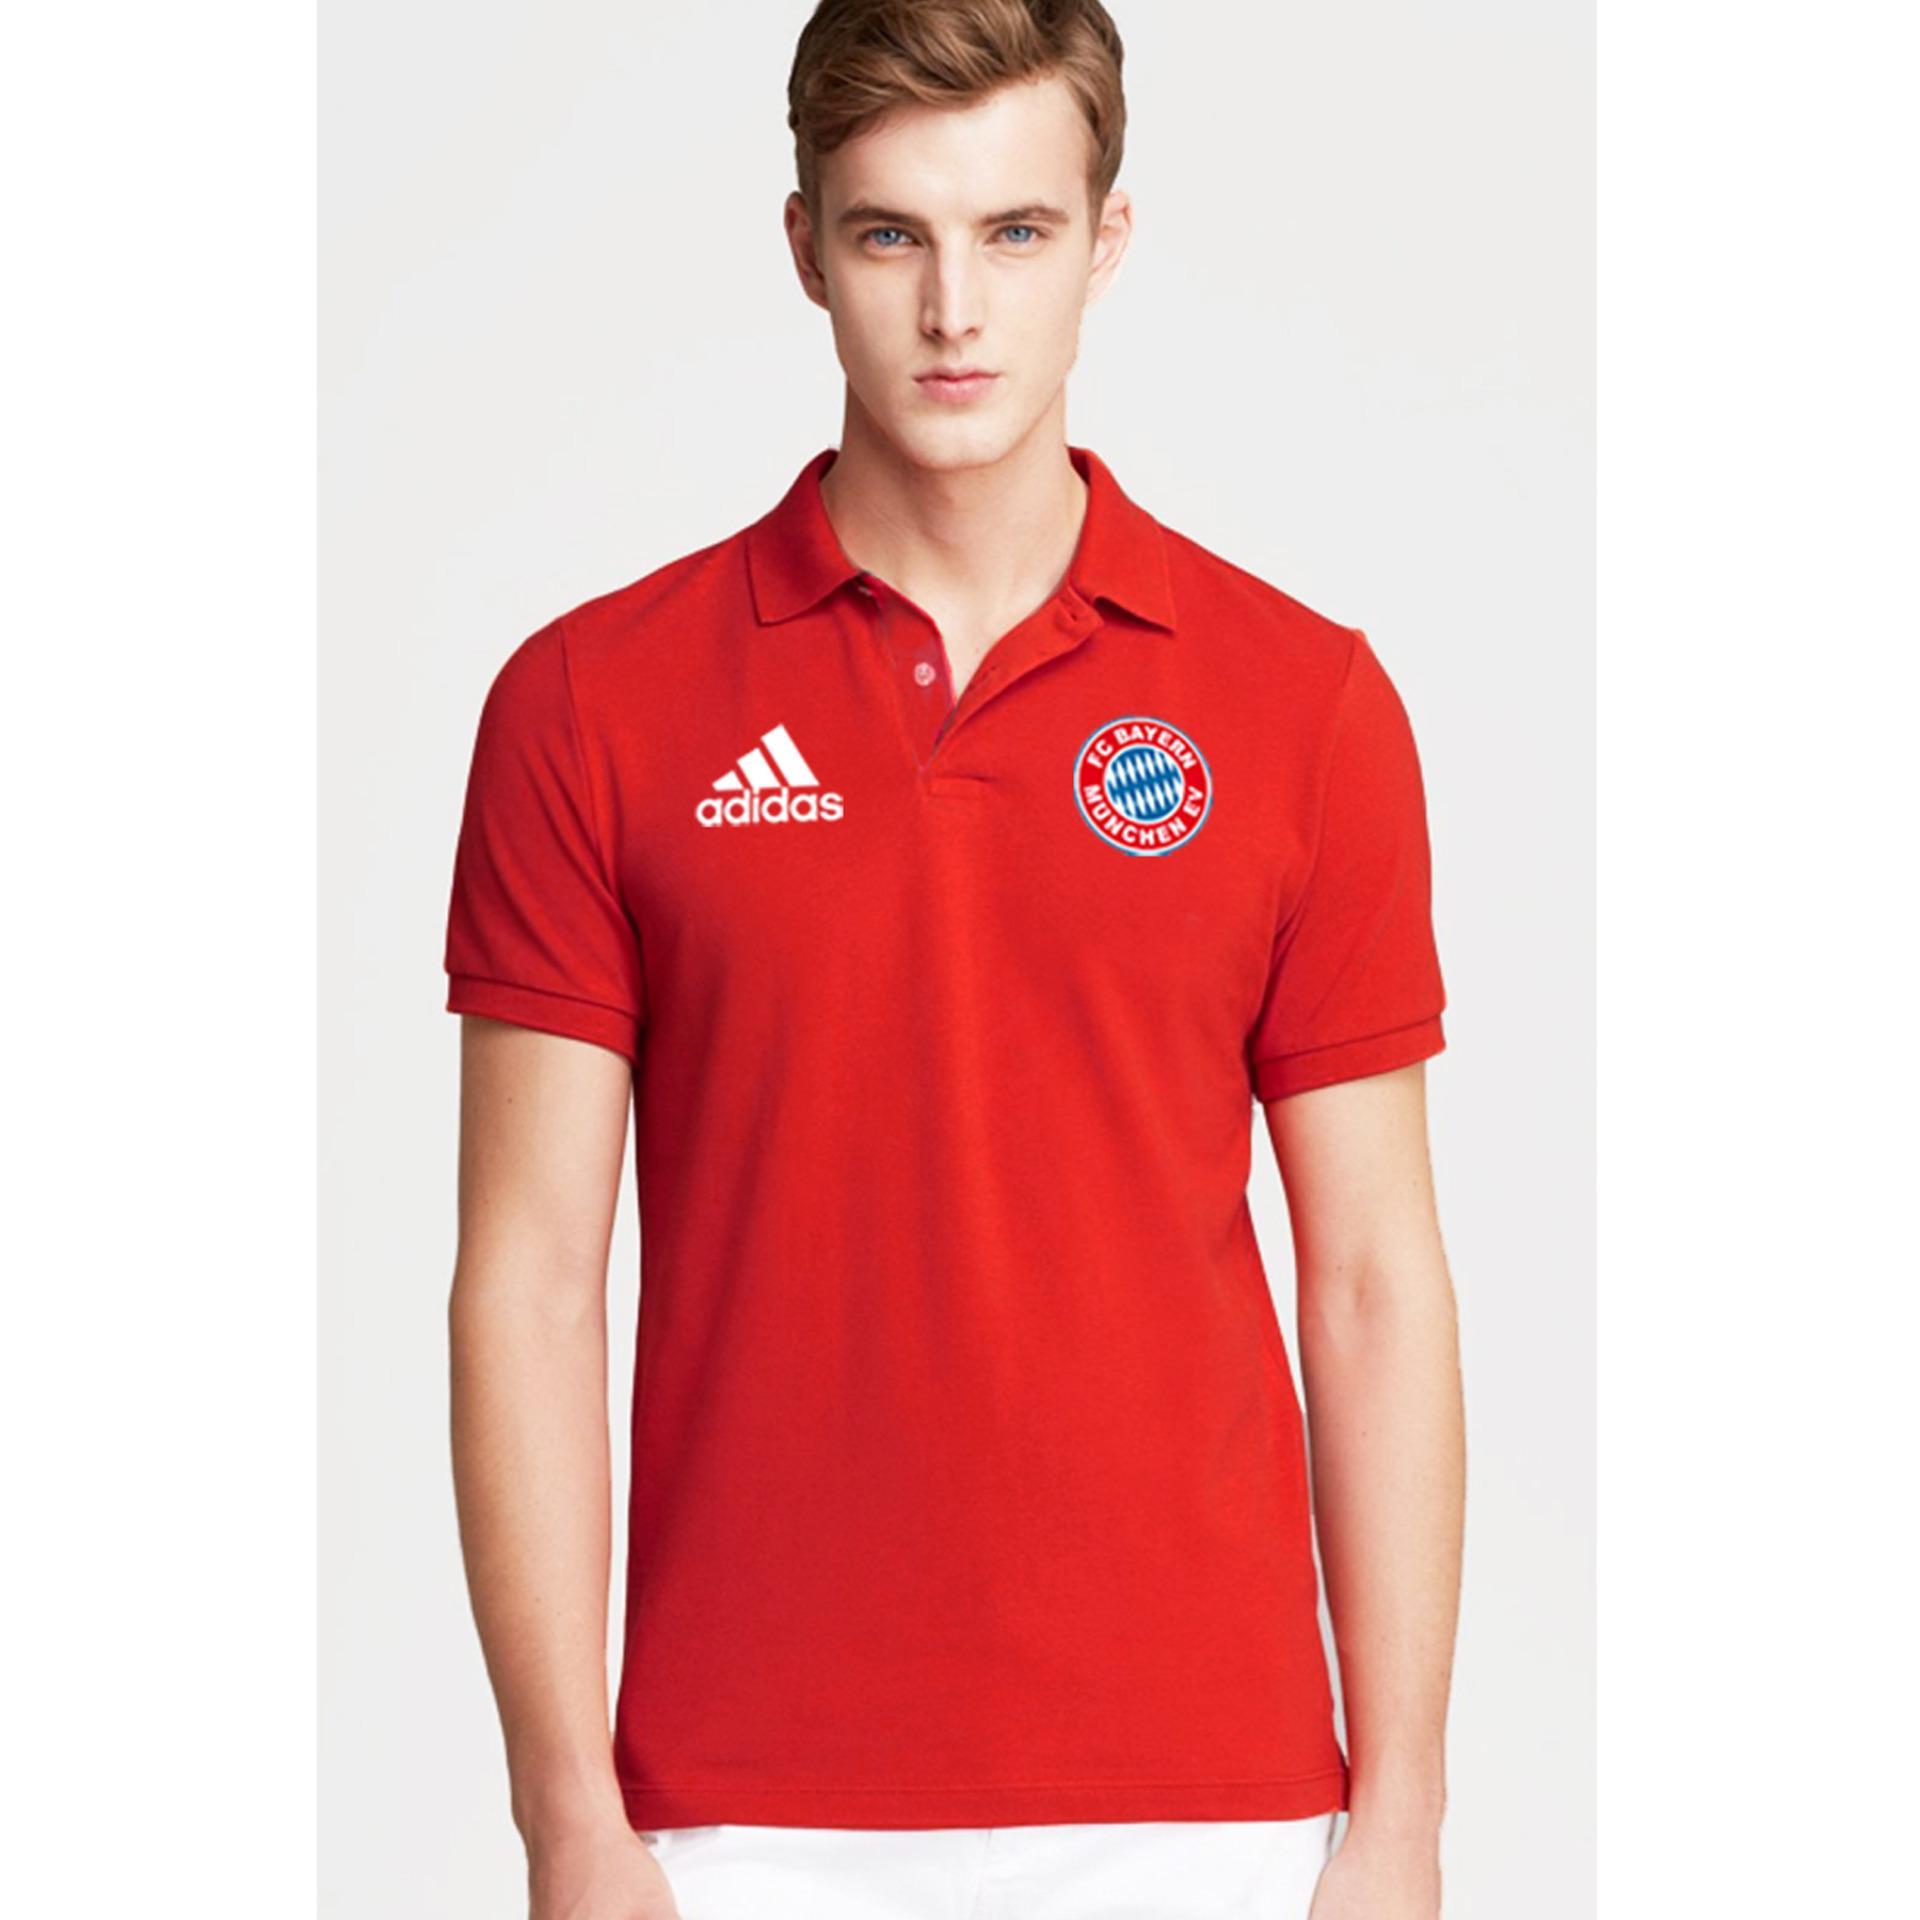 Just Cloth Kaos Polo Bayern Munchen The Bavarian Merah Di Banten